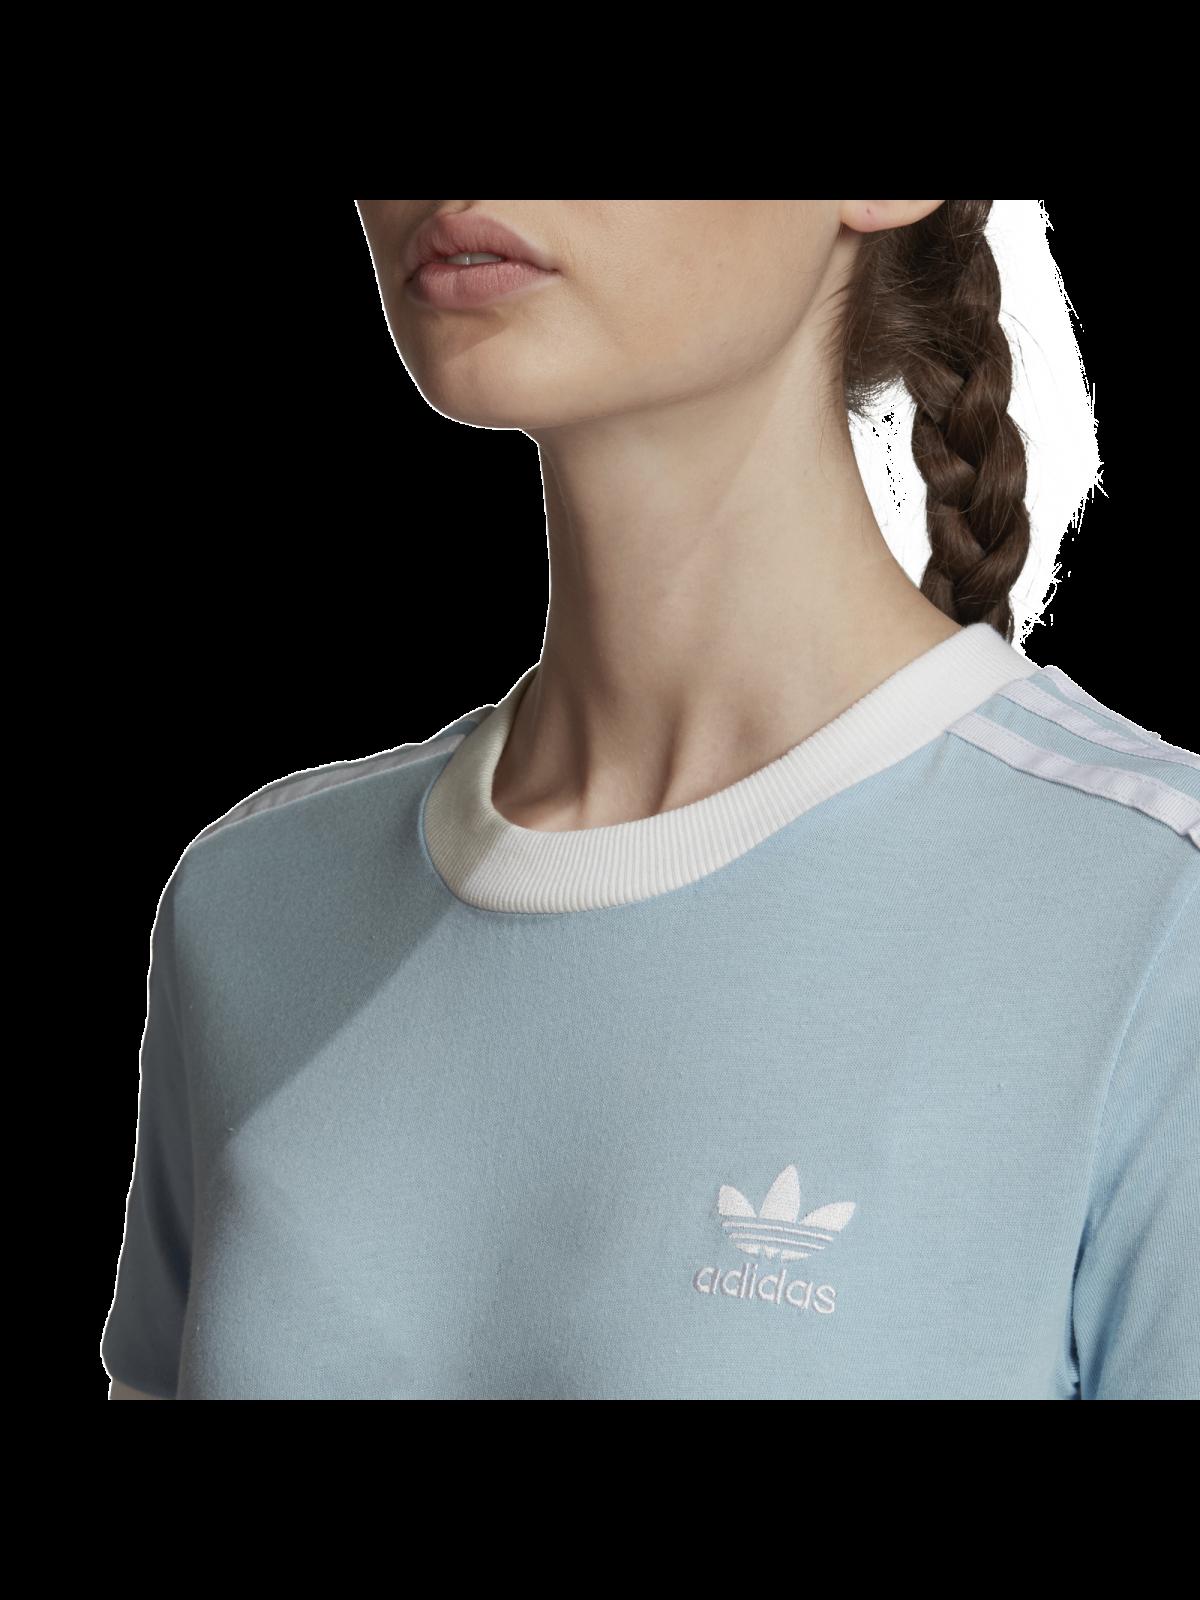 ADIDAS FM3322 Tee-Shirt bleu ciel